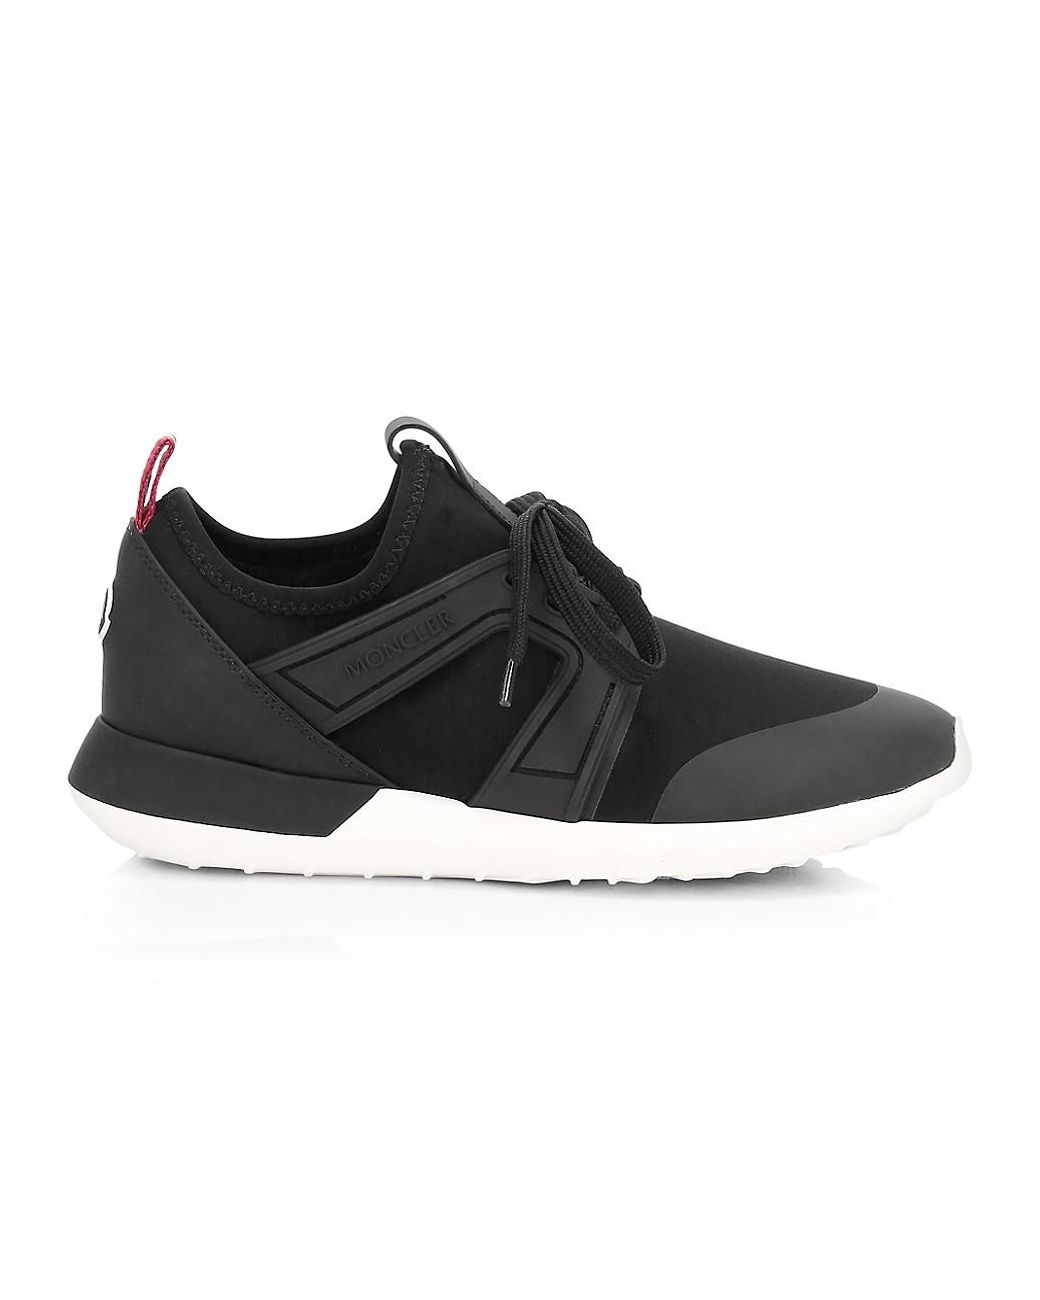 Meline Stretch Sneakers in Black